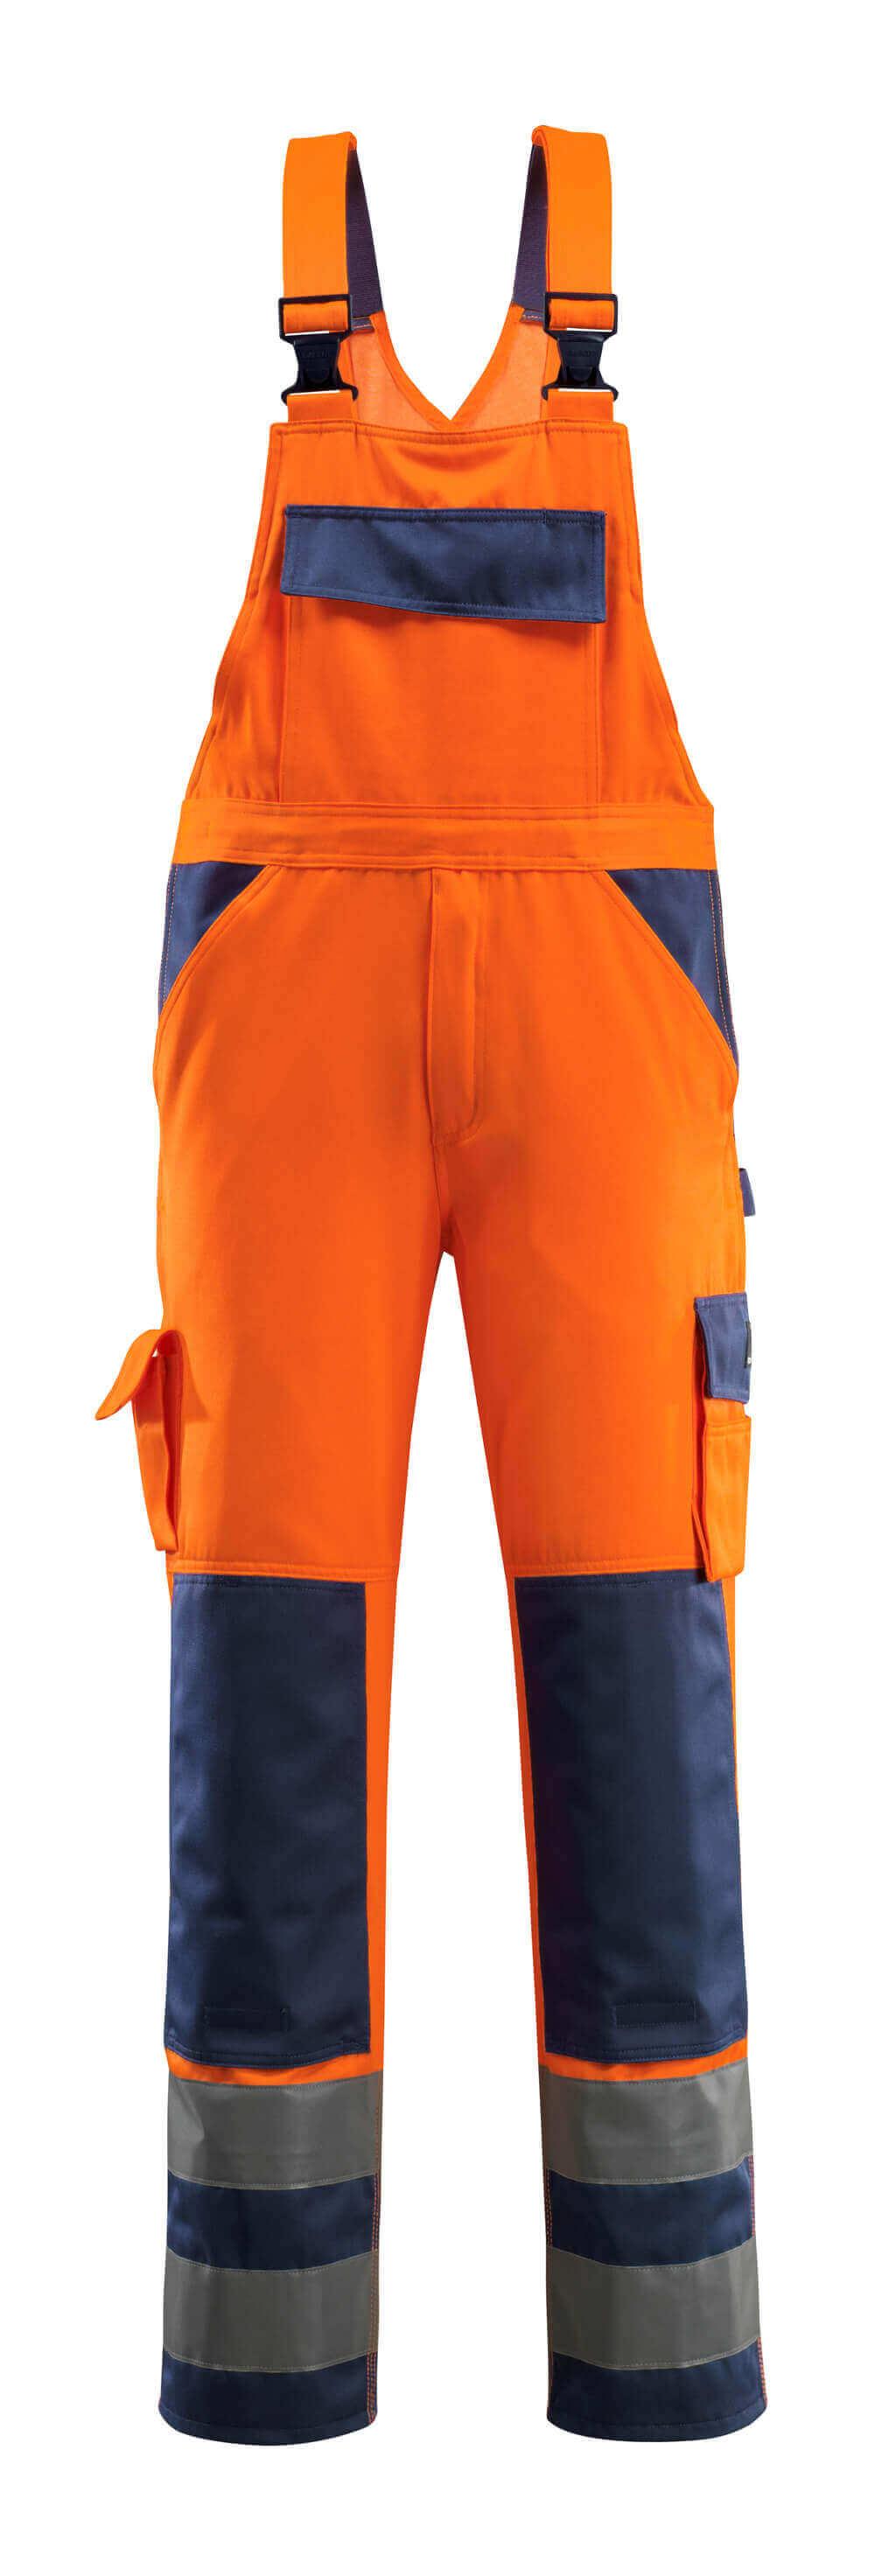 07169-860-141 Bib & Brace with kneepad pockets - hi-vis orange/navy